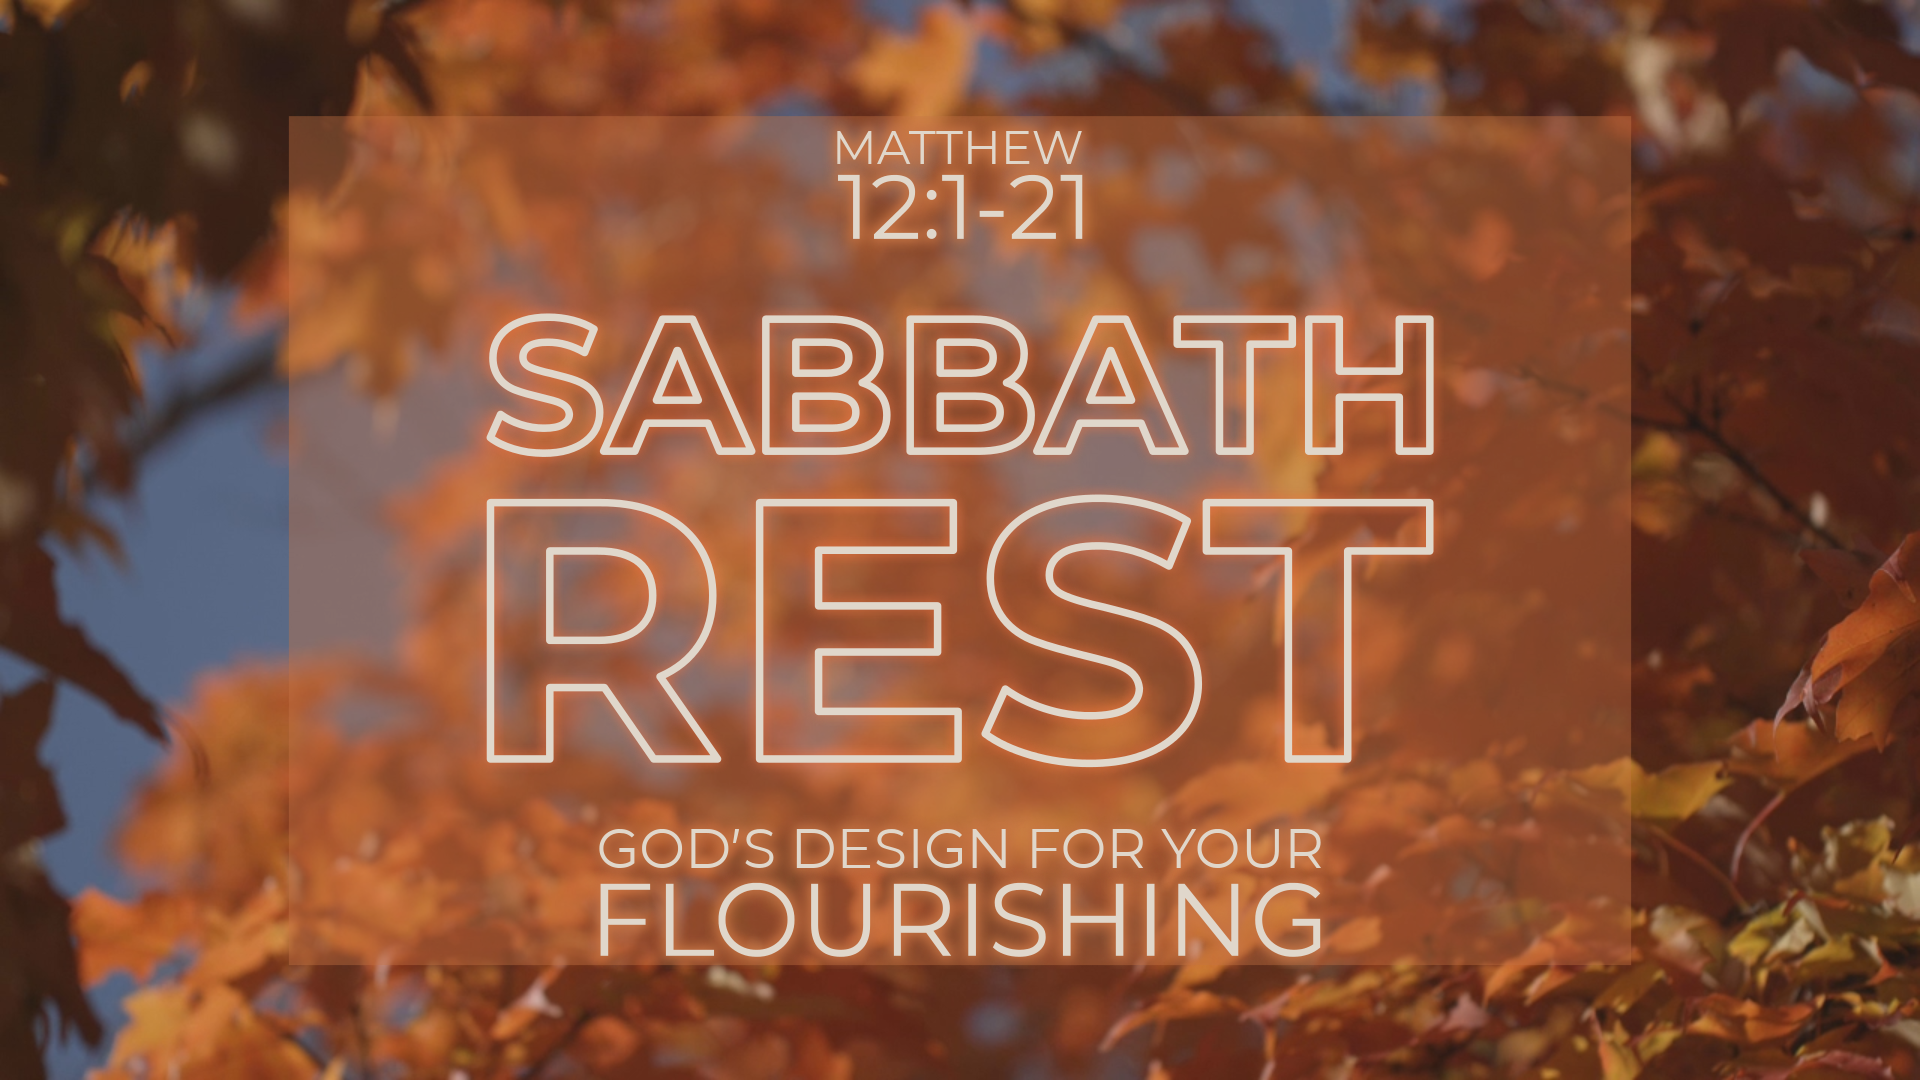 Sabbath Rest: God's Design for Your Flourishing